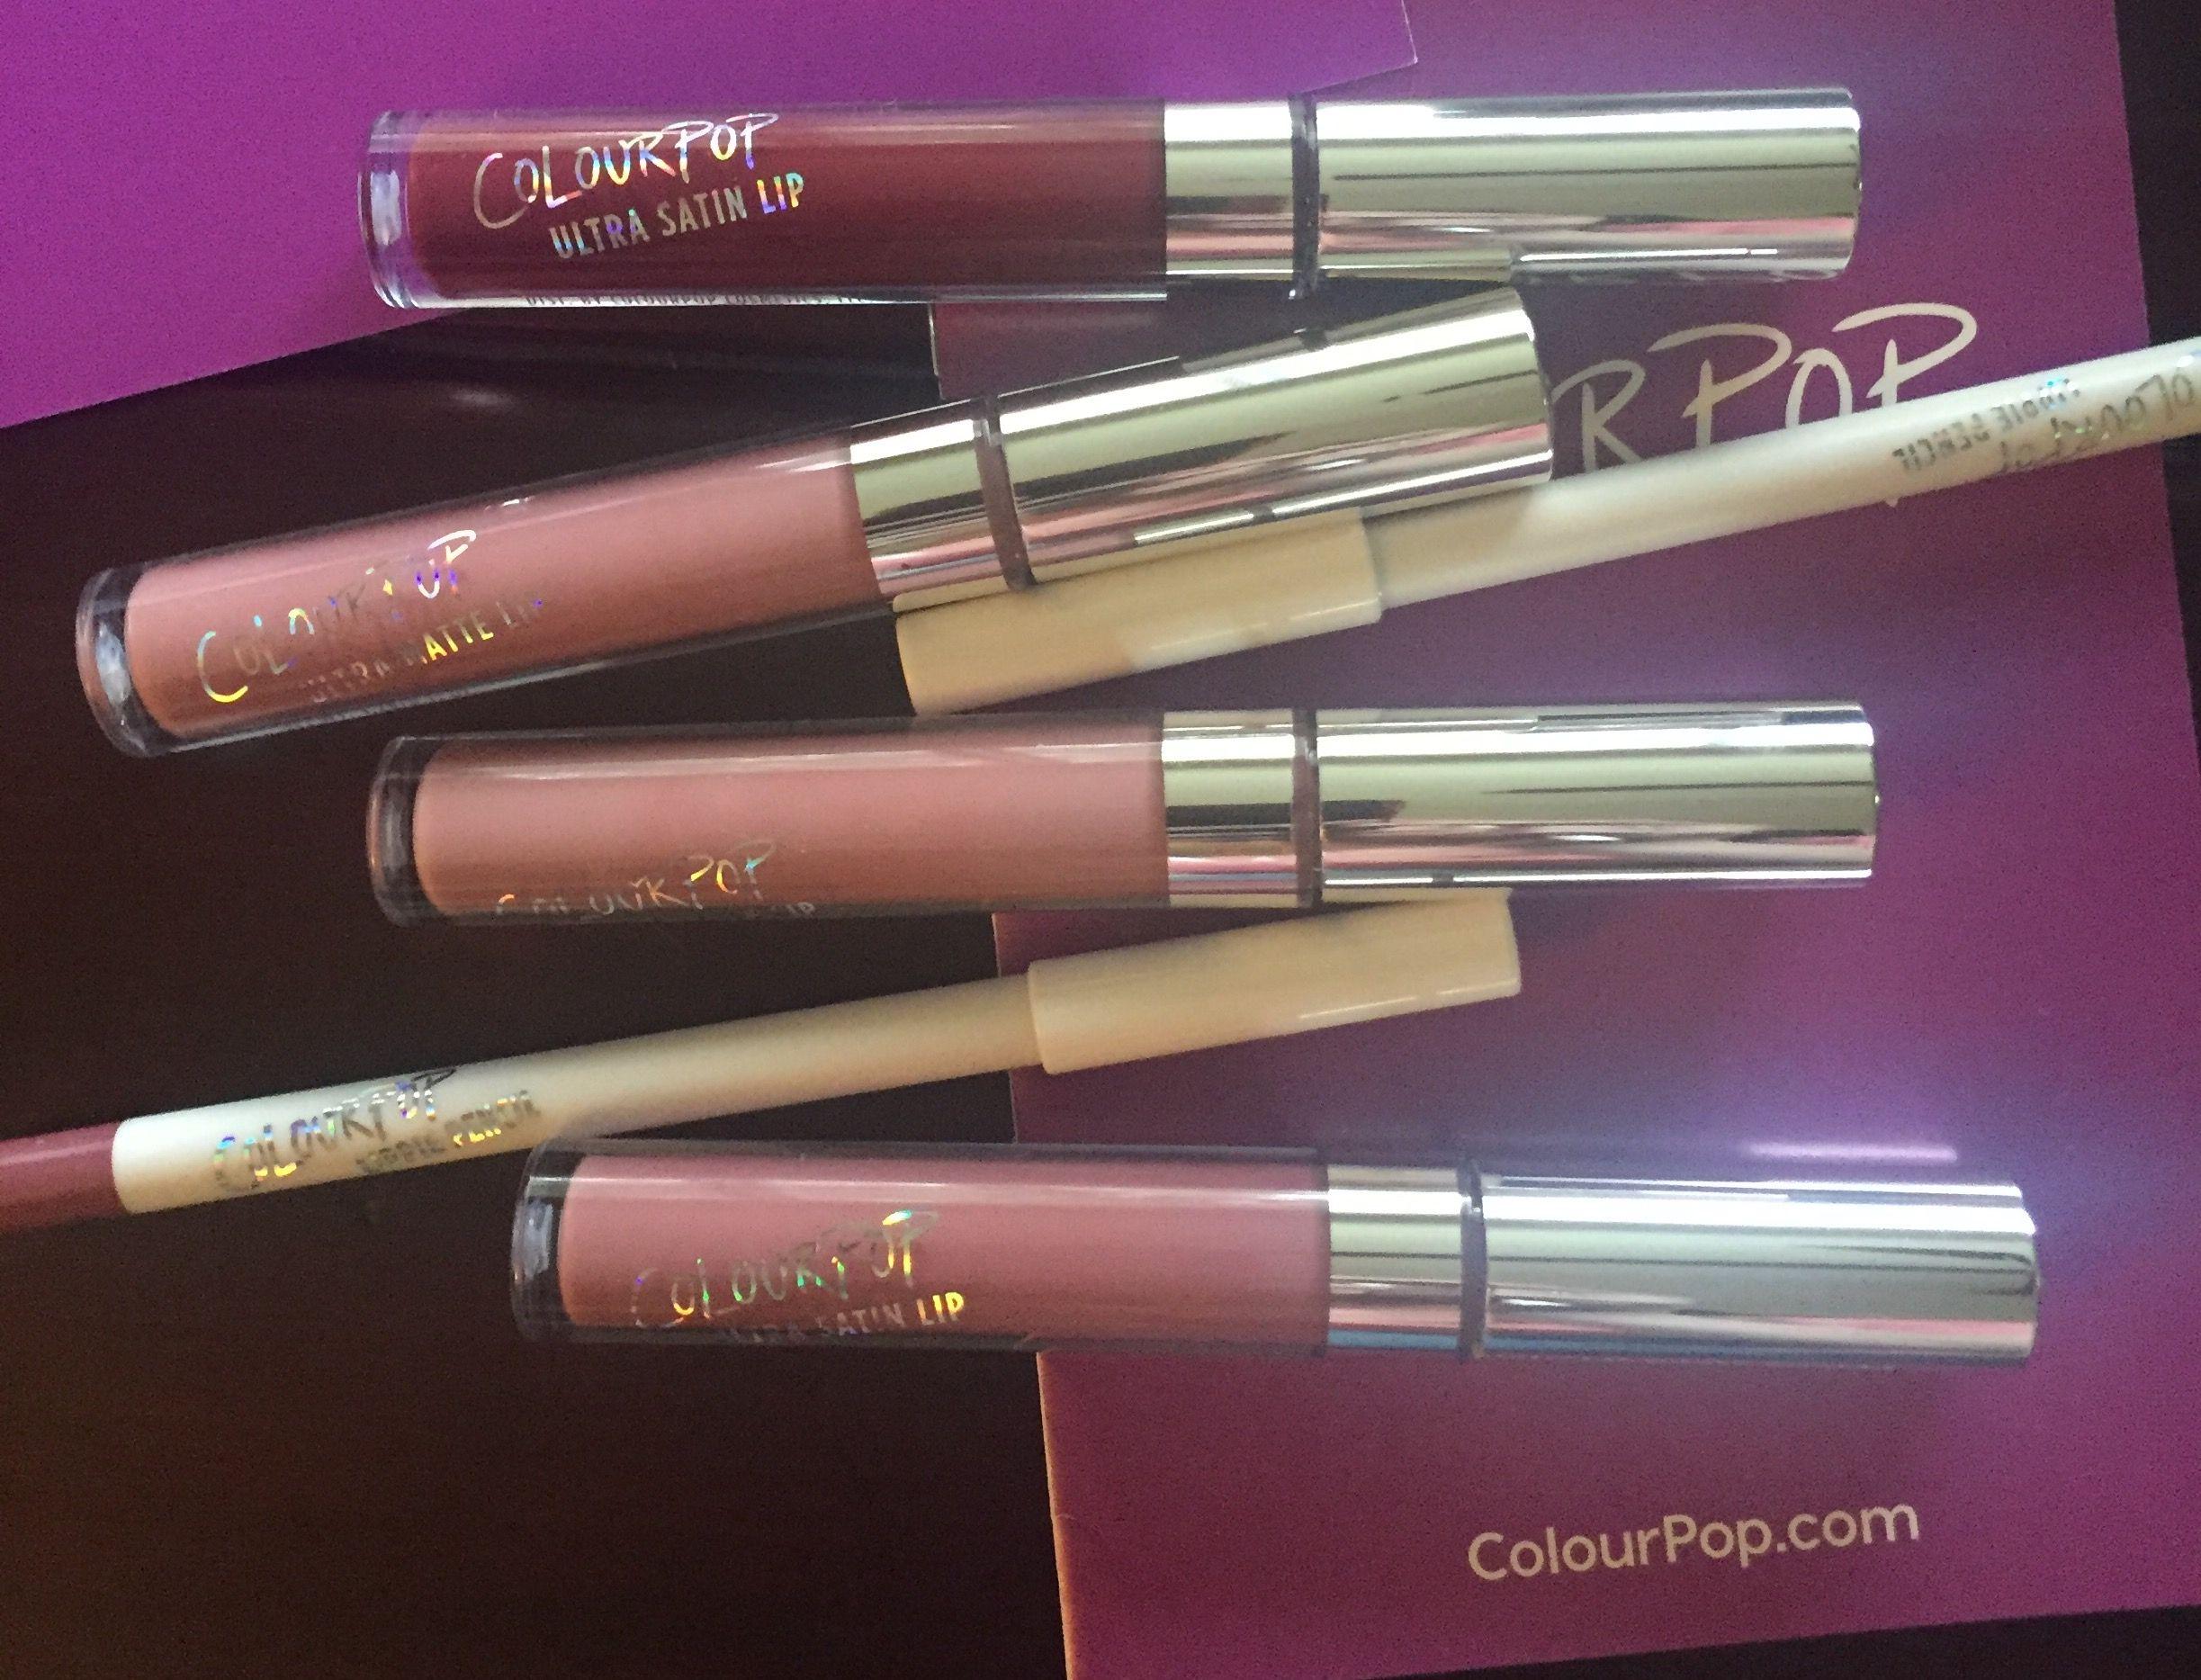 ColourPop new Glossy Lipsticks and Metallics! Glossier